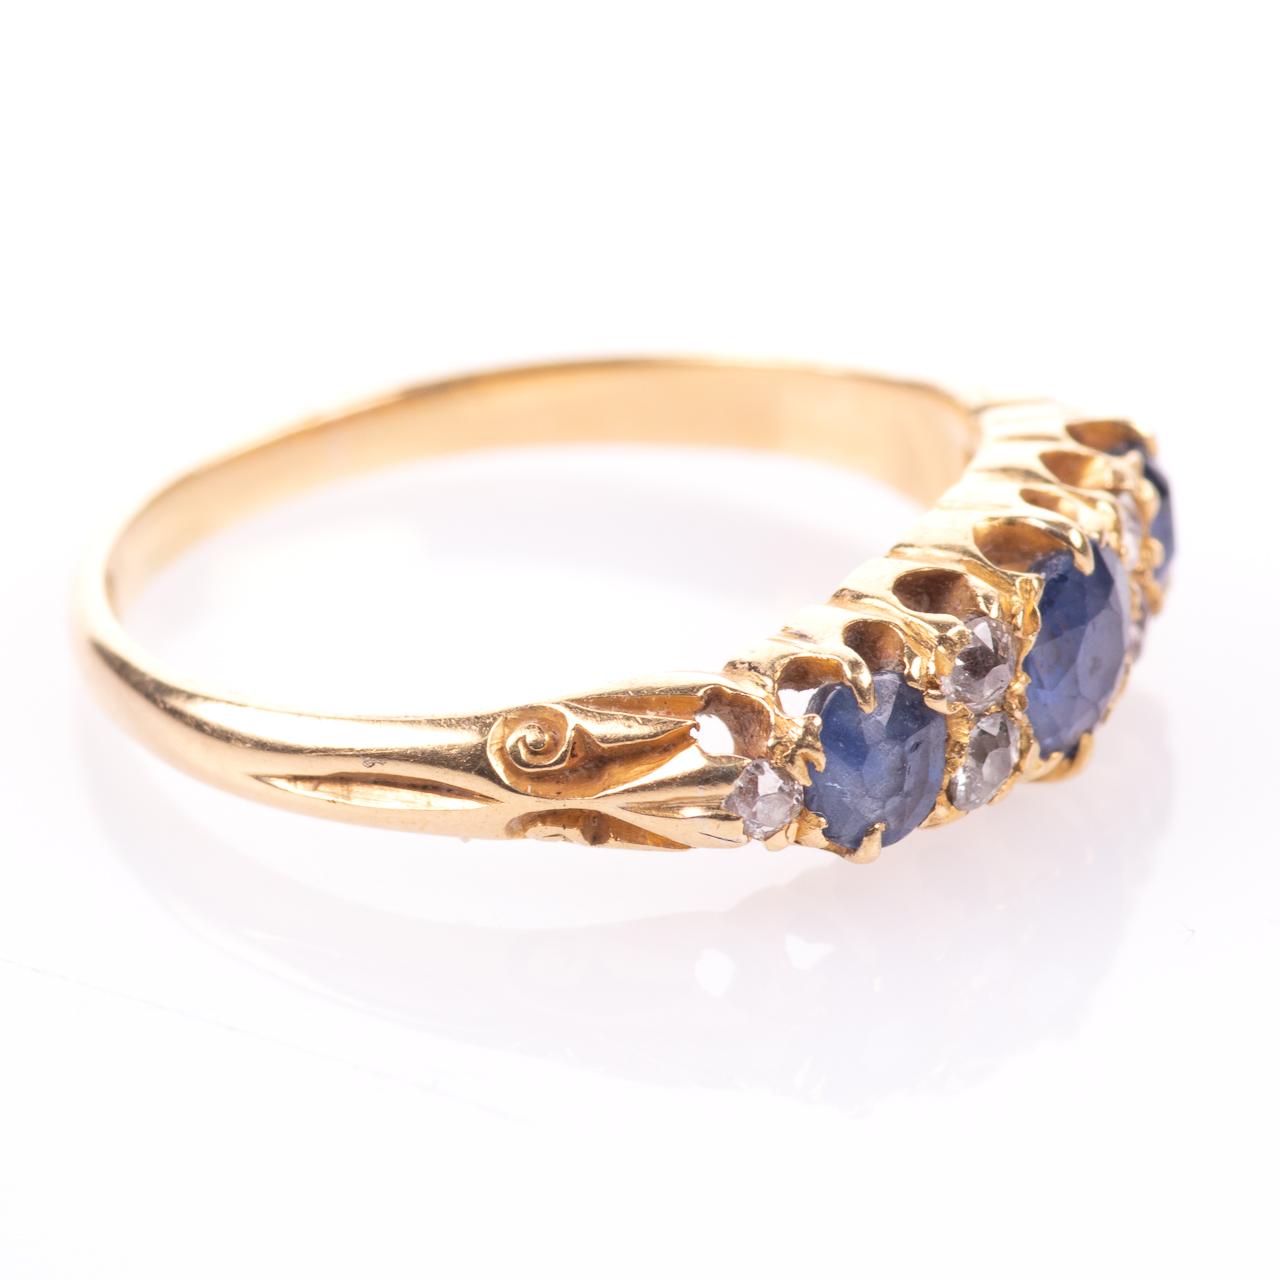 18ct Gold George V 1ct Sapphire & Diamond Ring London 1908 - Image 7 of 7